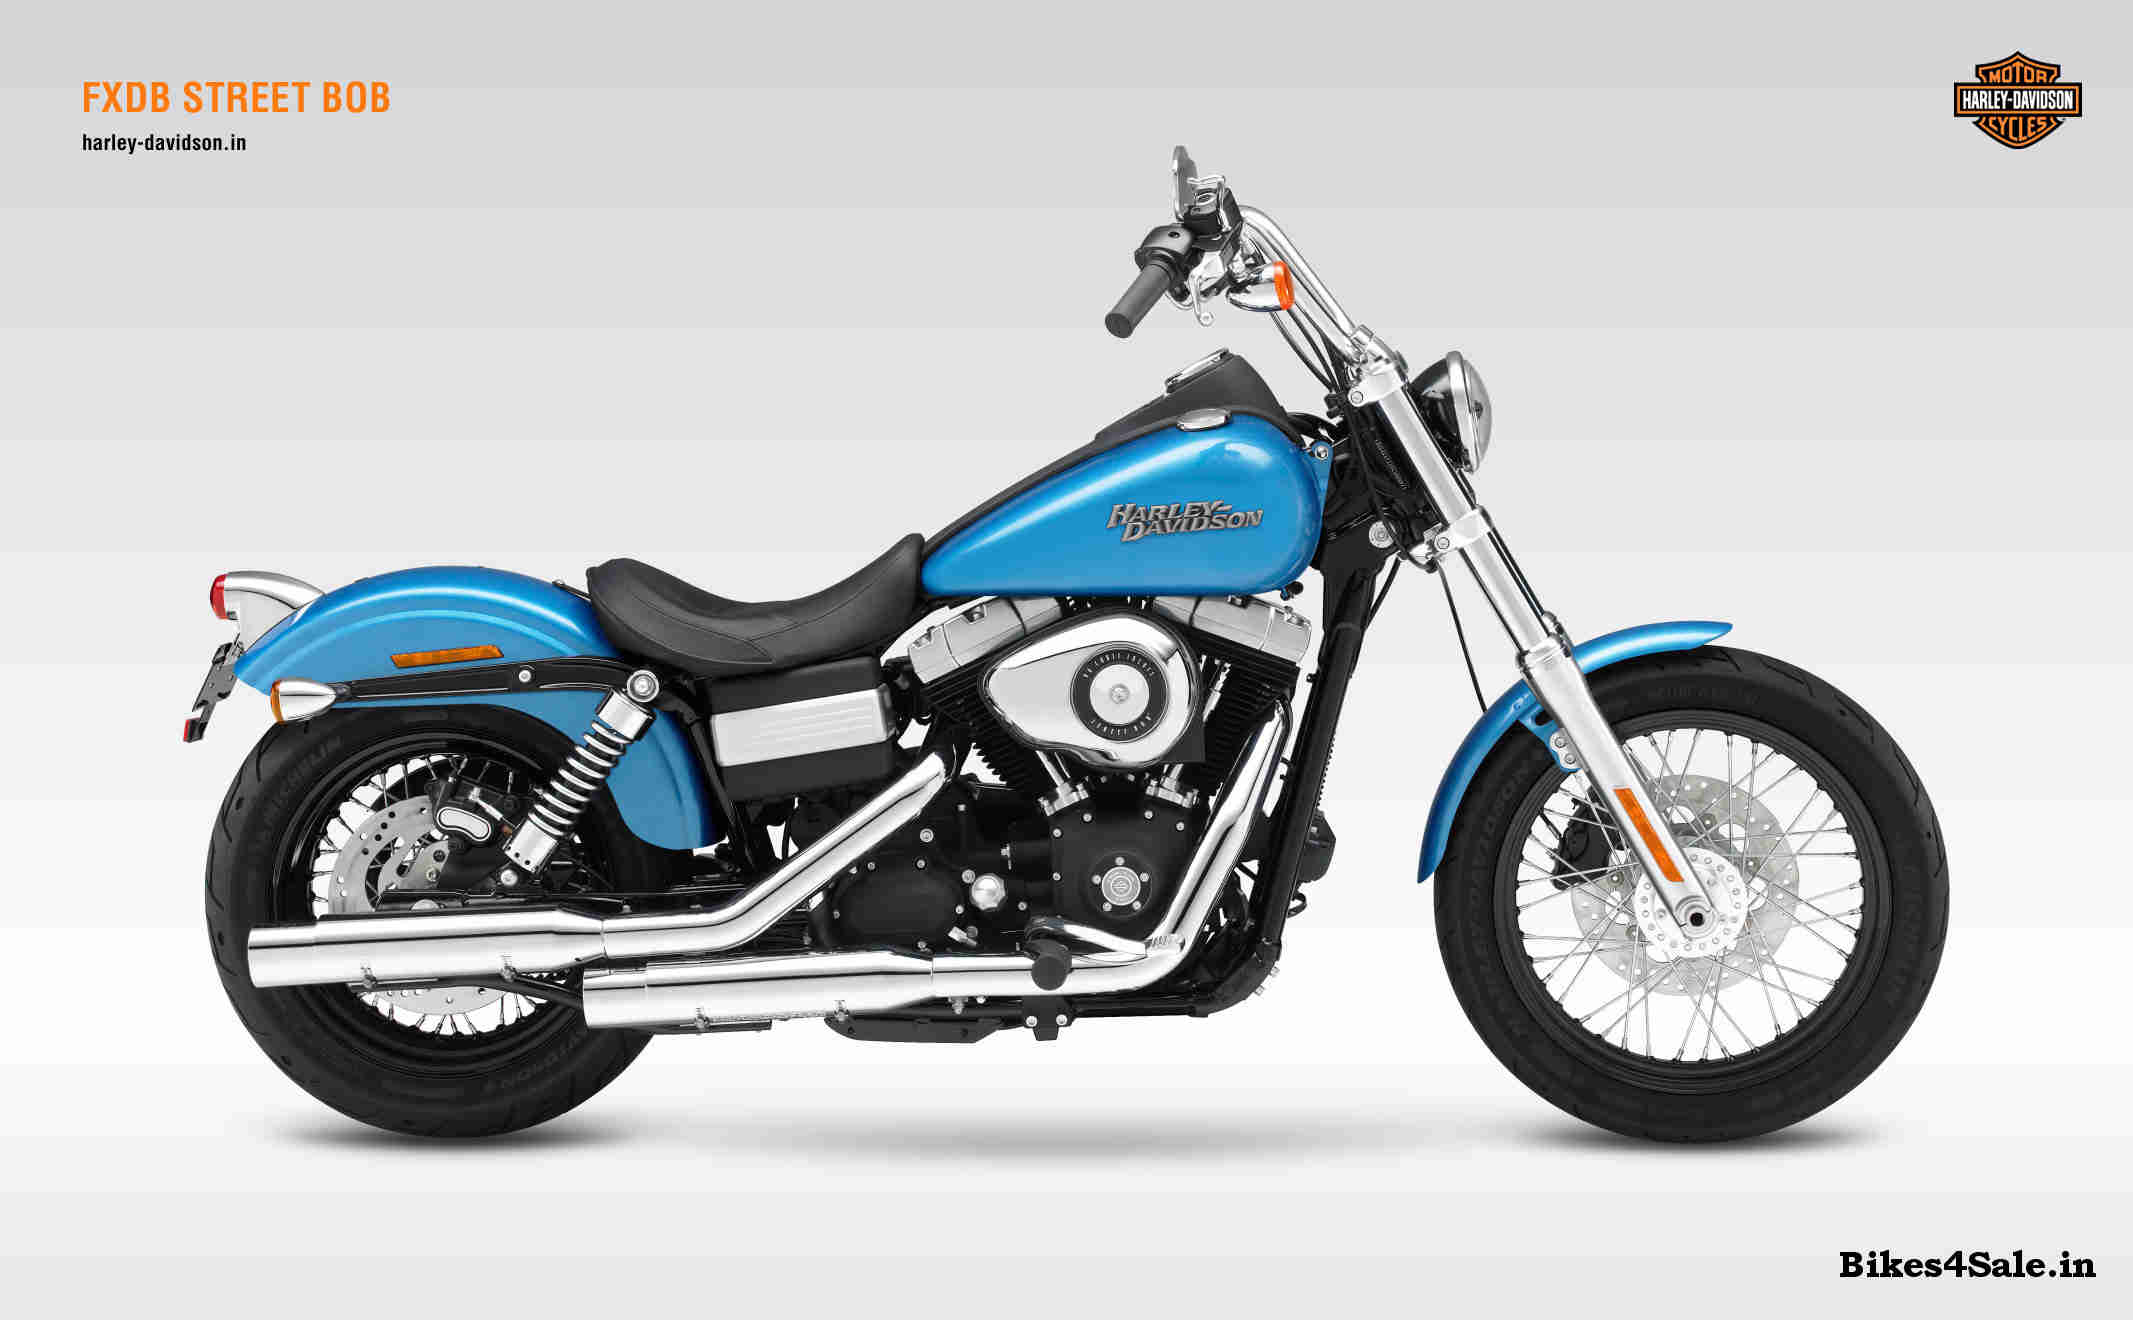 Harley Davidson FXDB Street Bob Photo